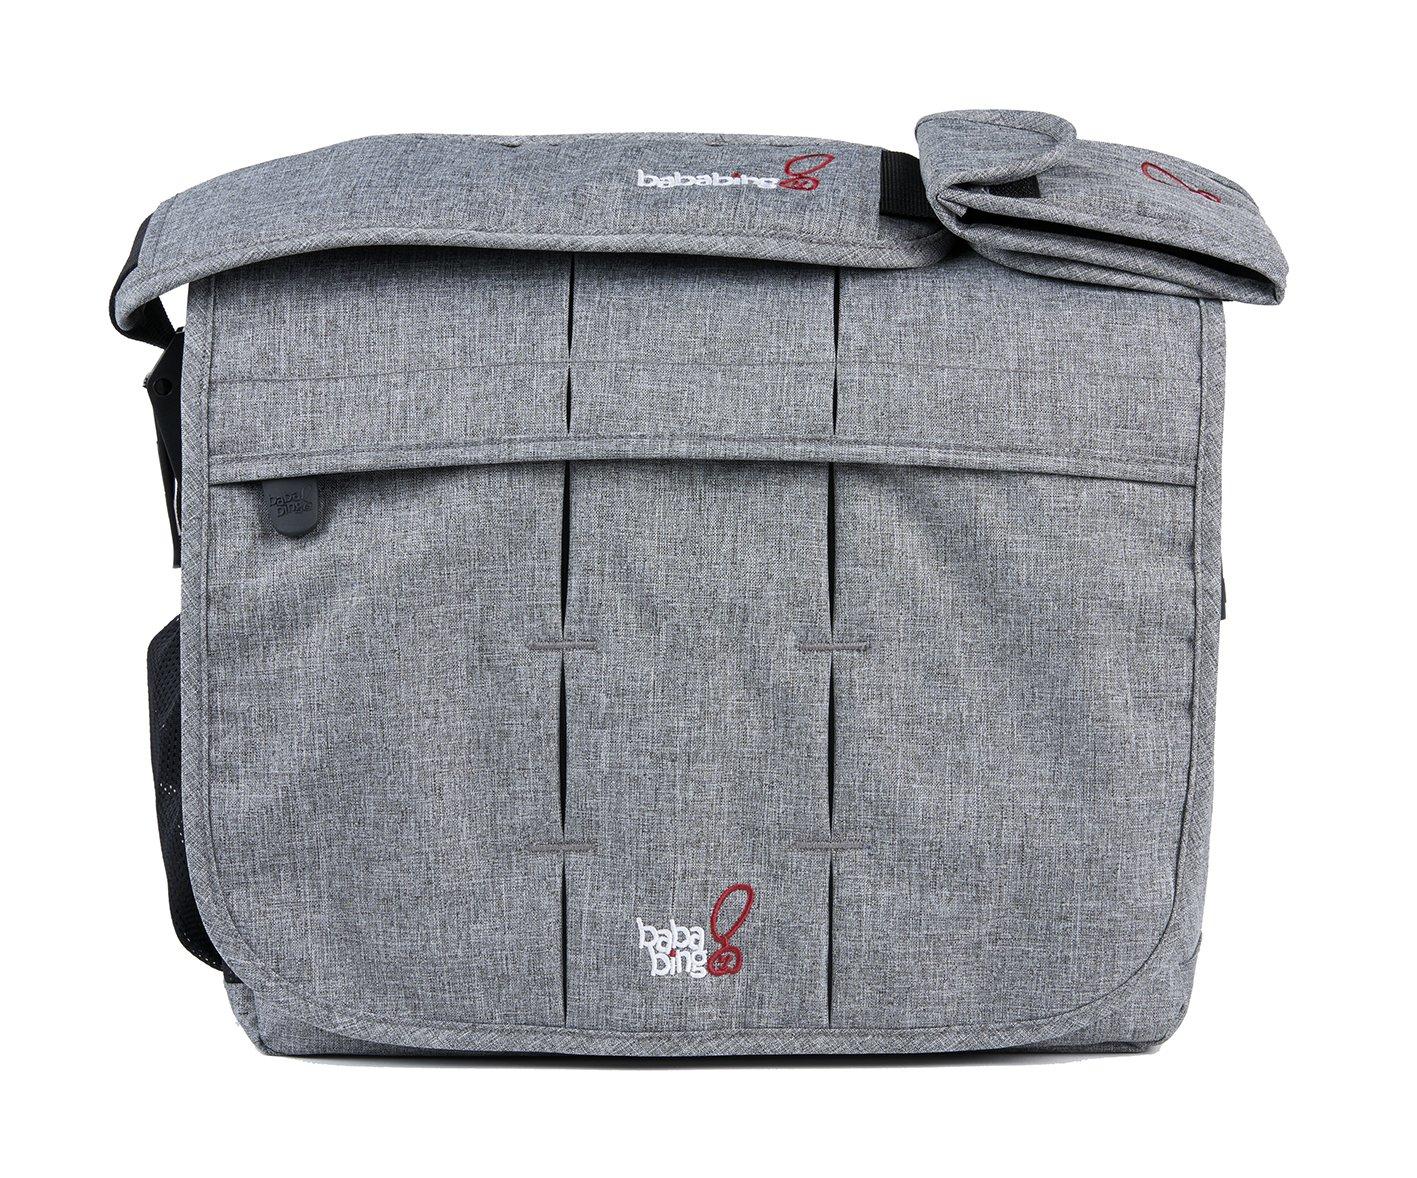 BabaBing! Daytripper Deluxe Changing Bag, Grey Marl baba bing BB57-001